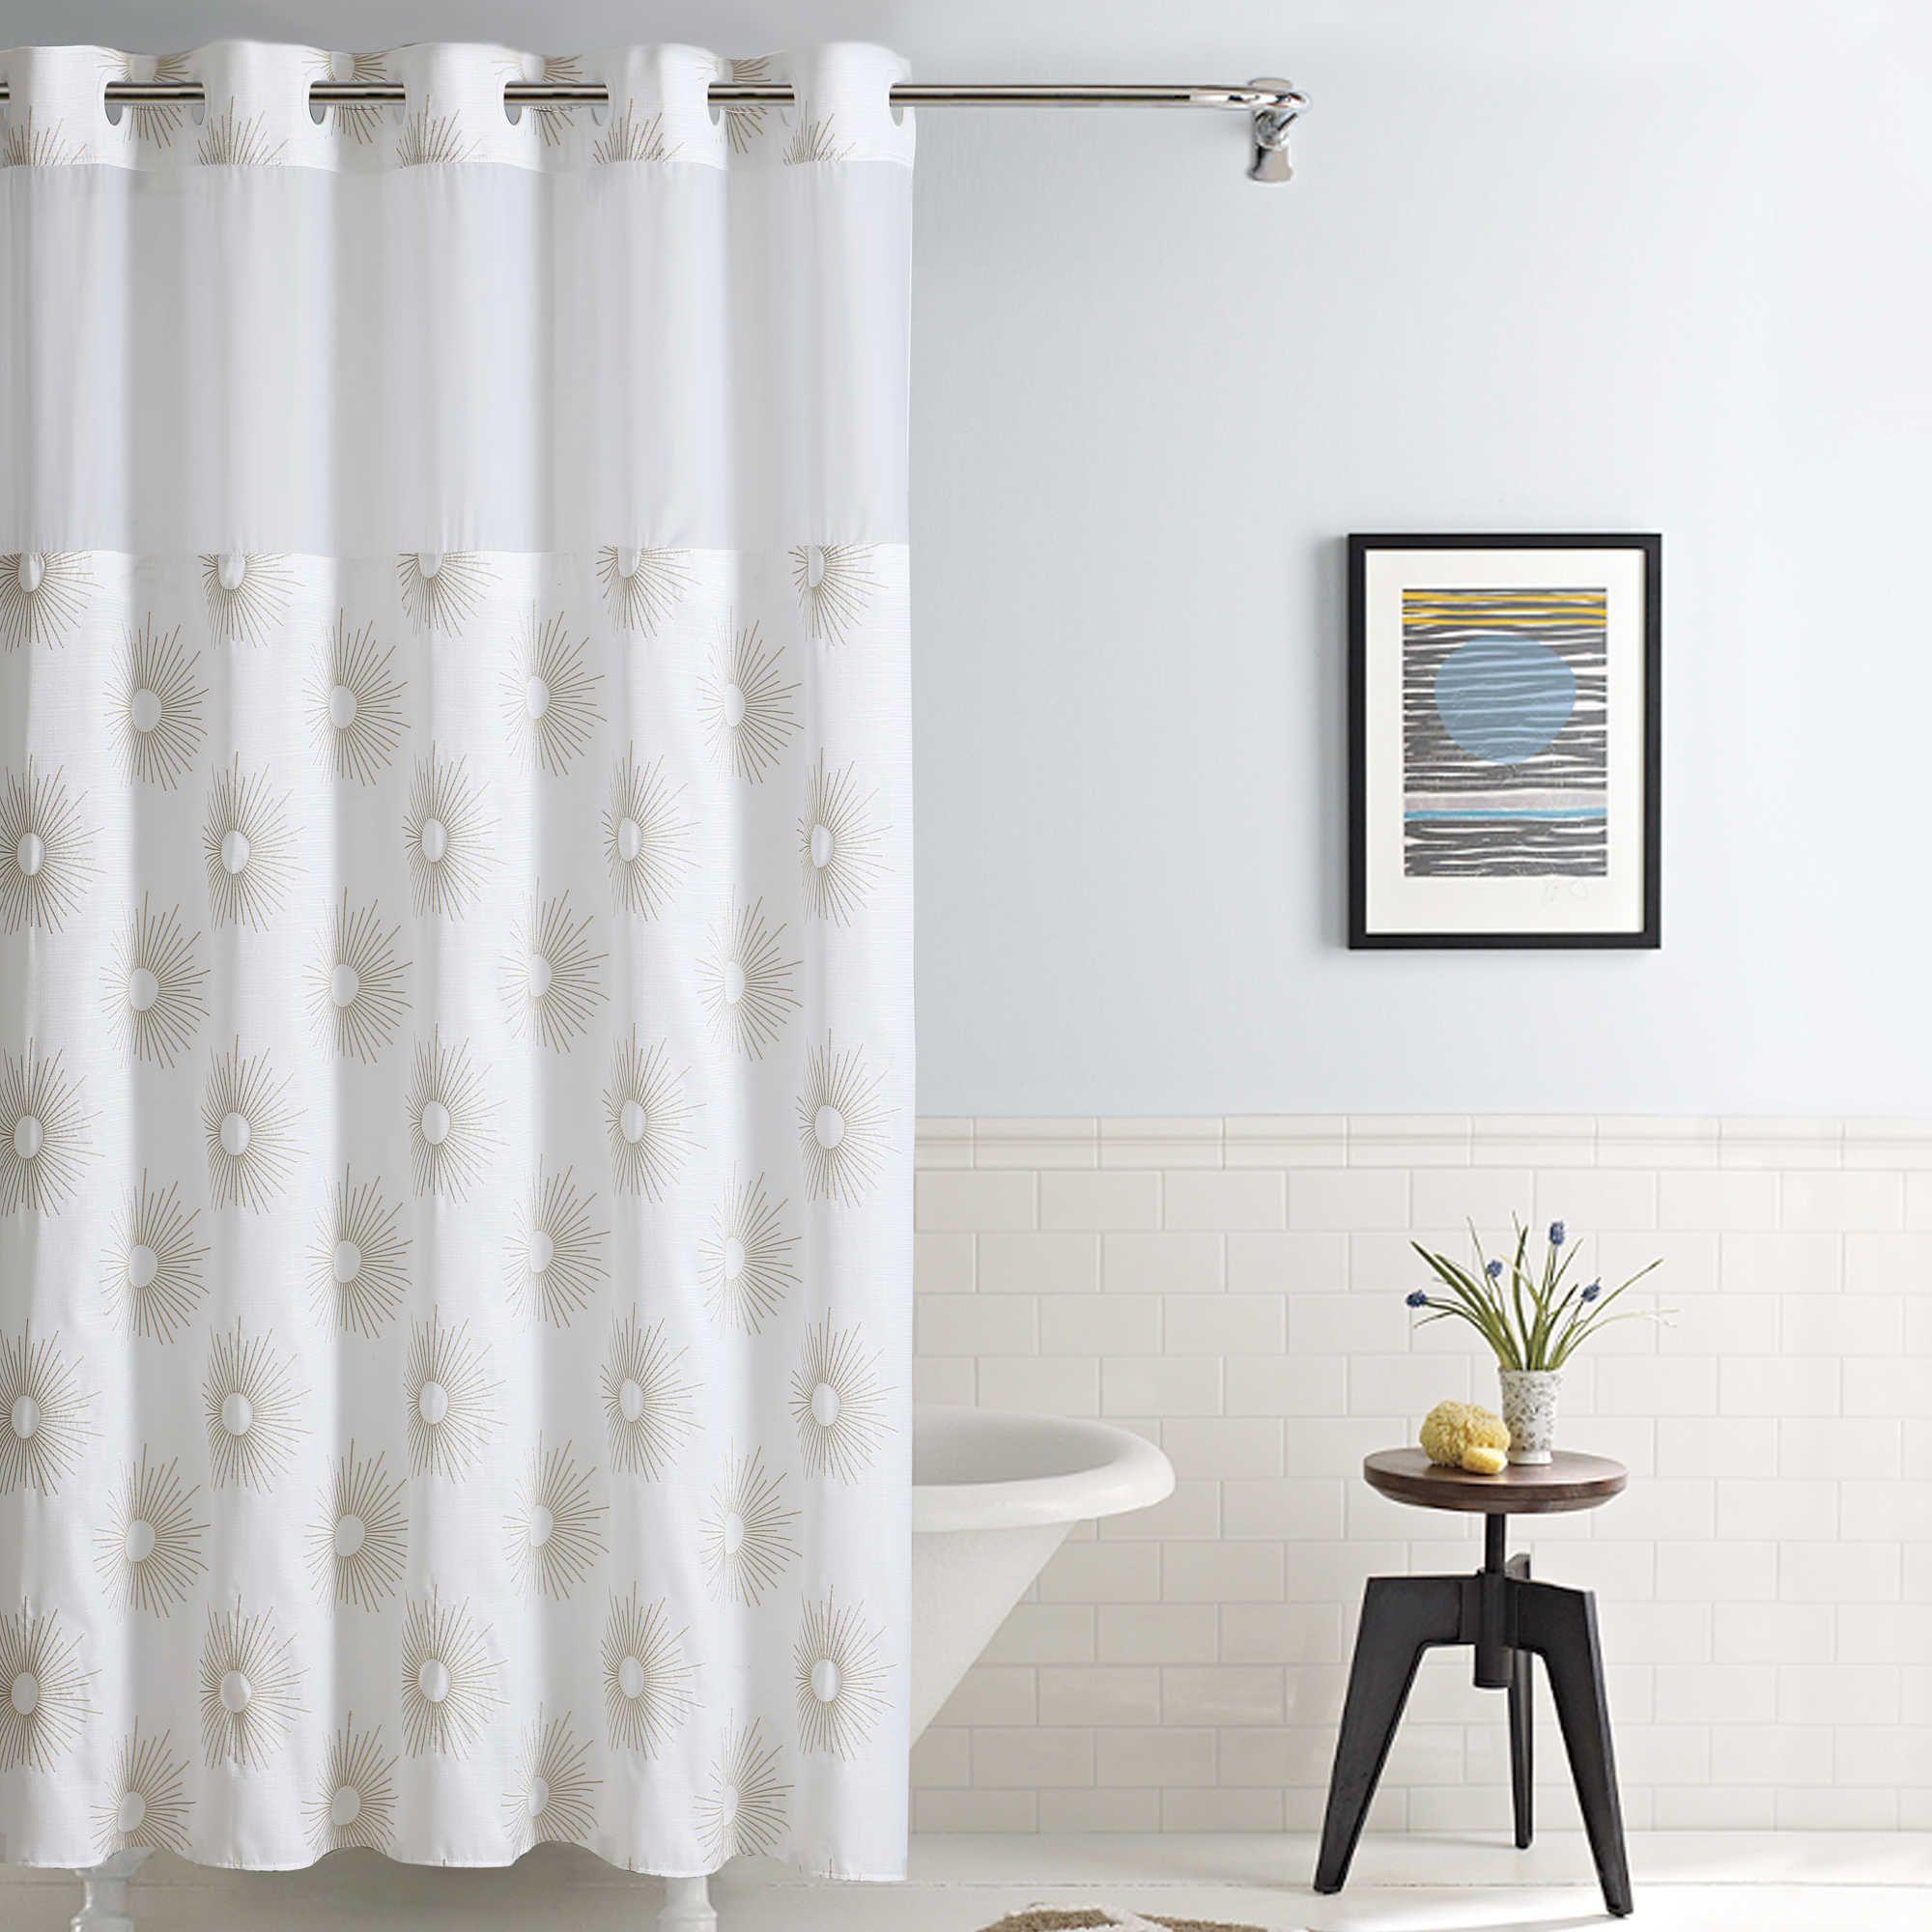 Hookless Sunburst Fabric Shower Curtain In Metallic Gold Fabric